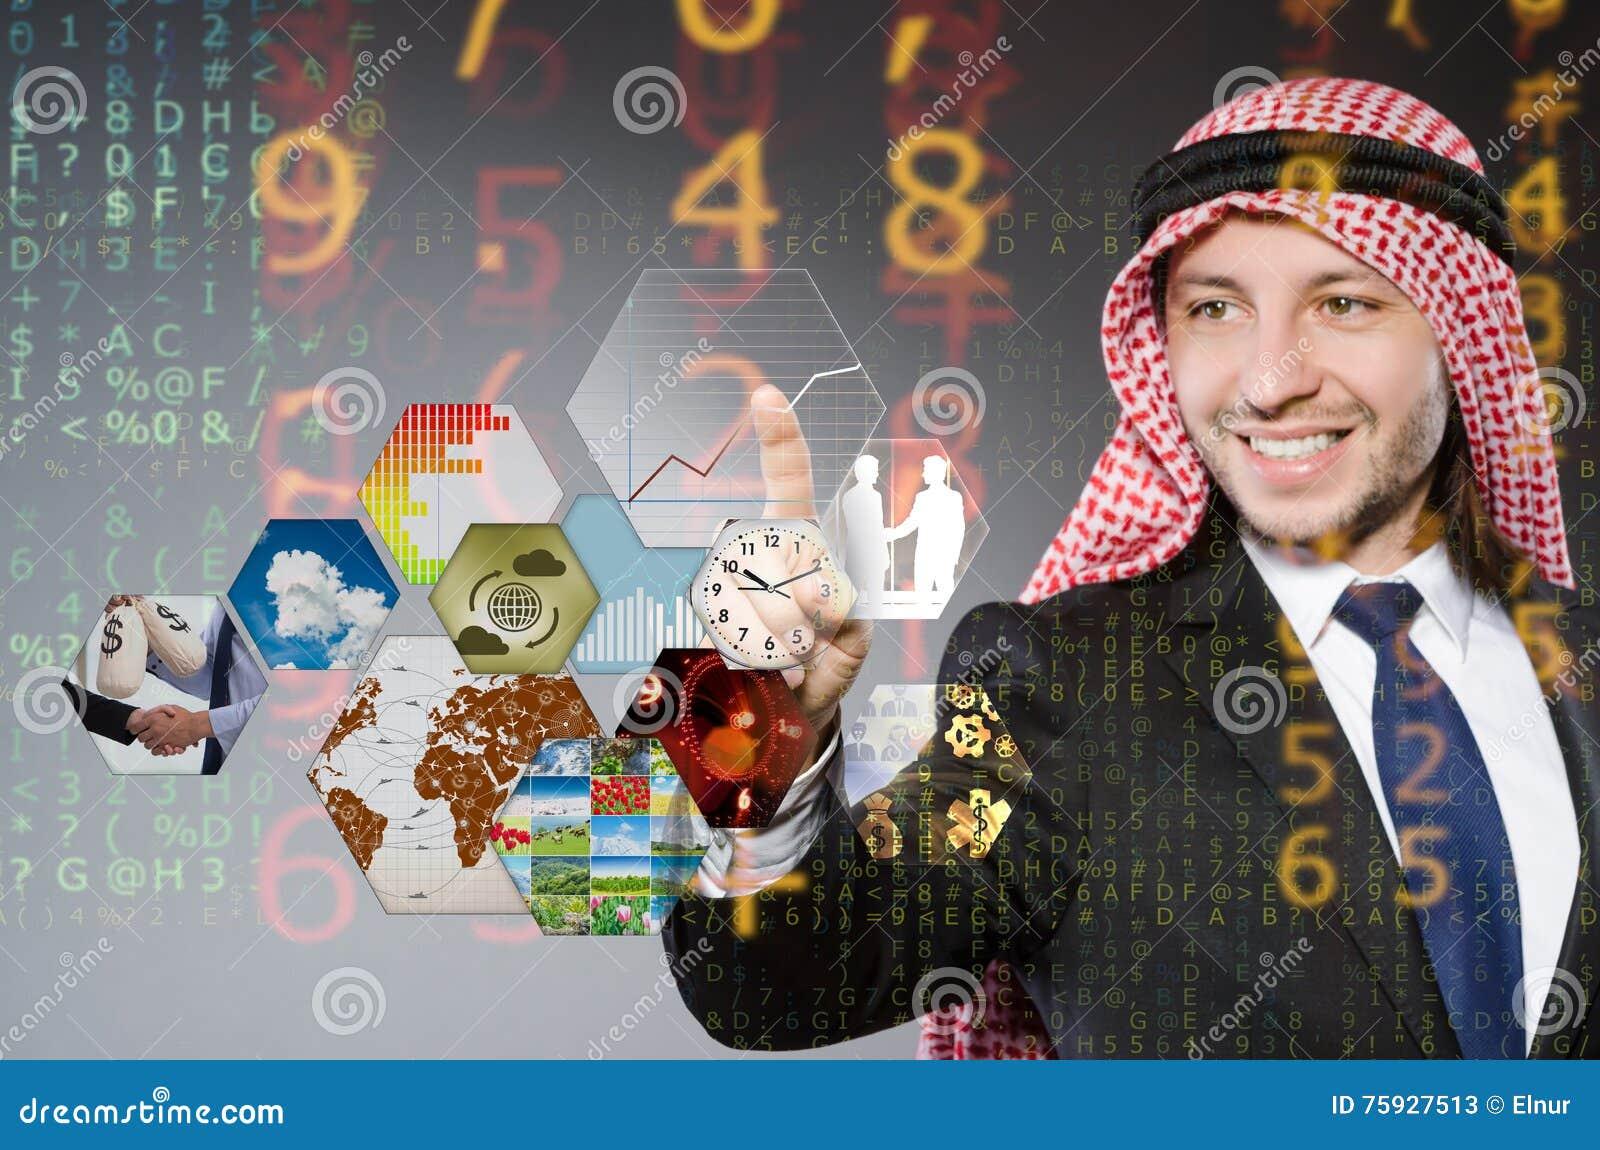 The arab businessman pressing virtual buttons